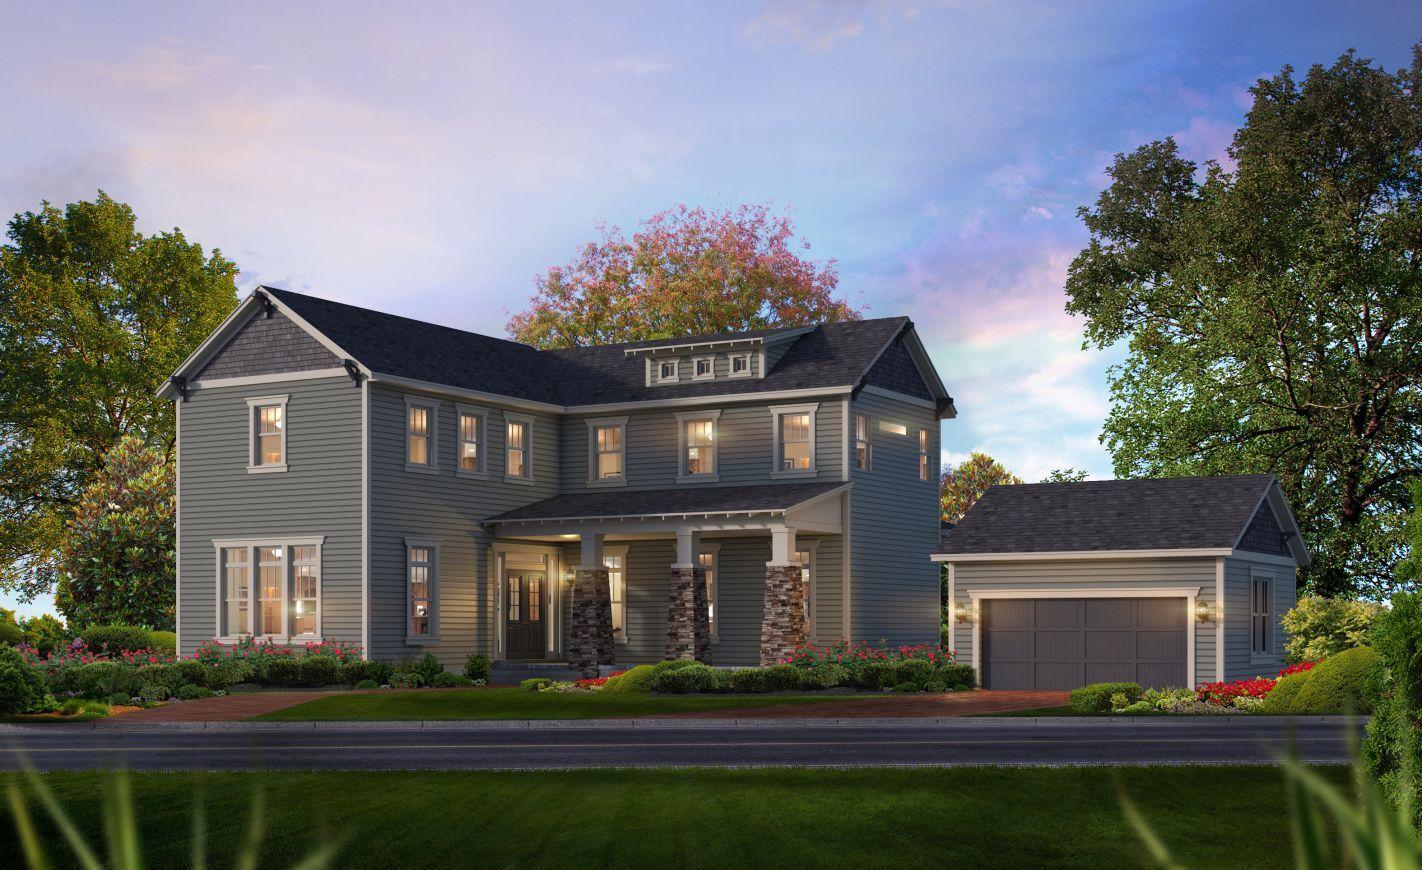 13922 Lake Fishhawk Drive, Fish Hawk, FL Homes & Land - Real Estate